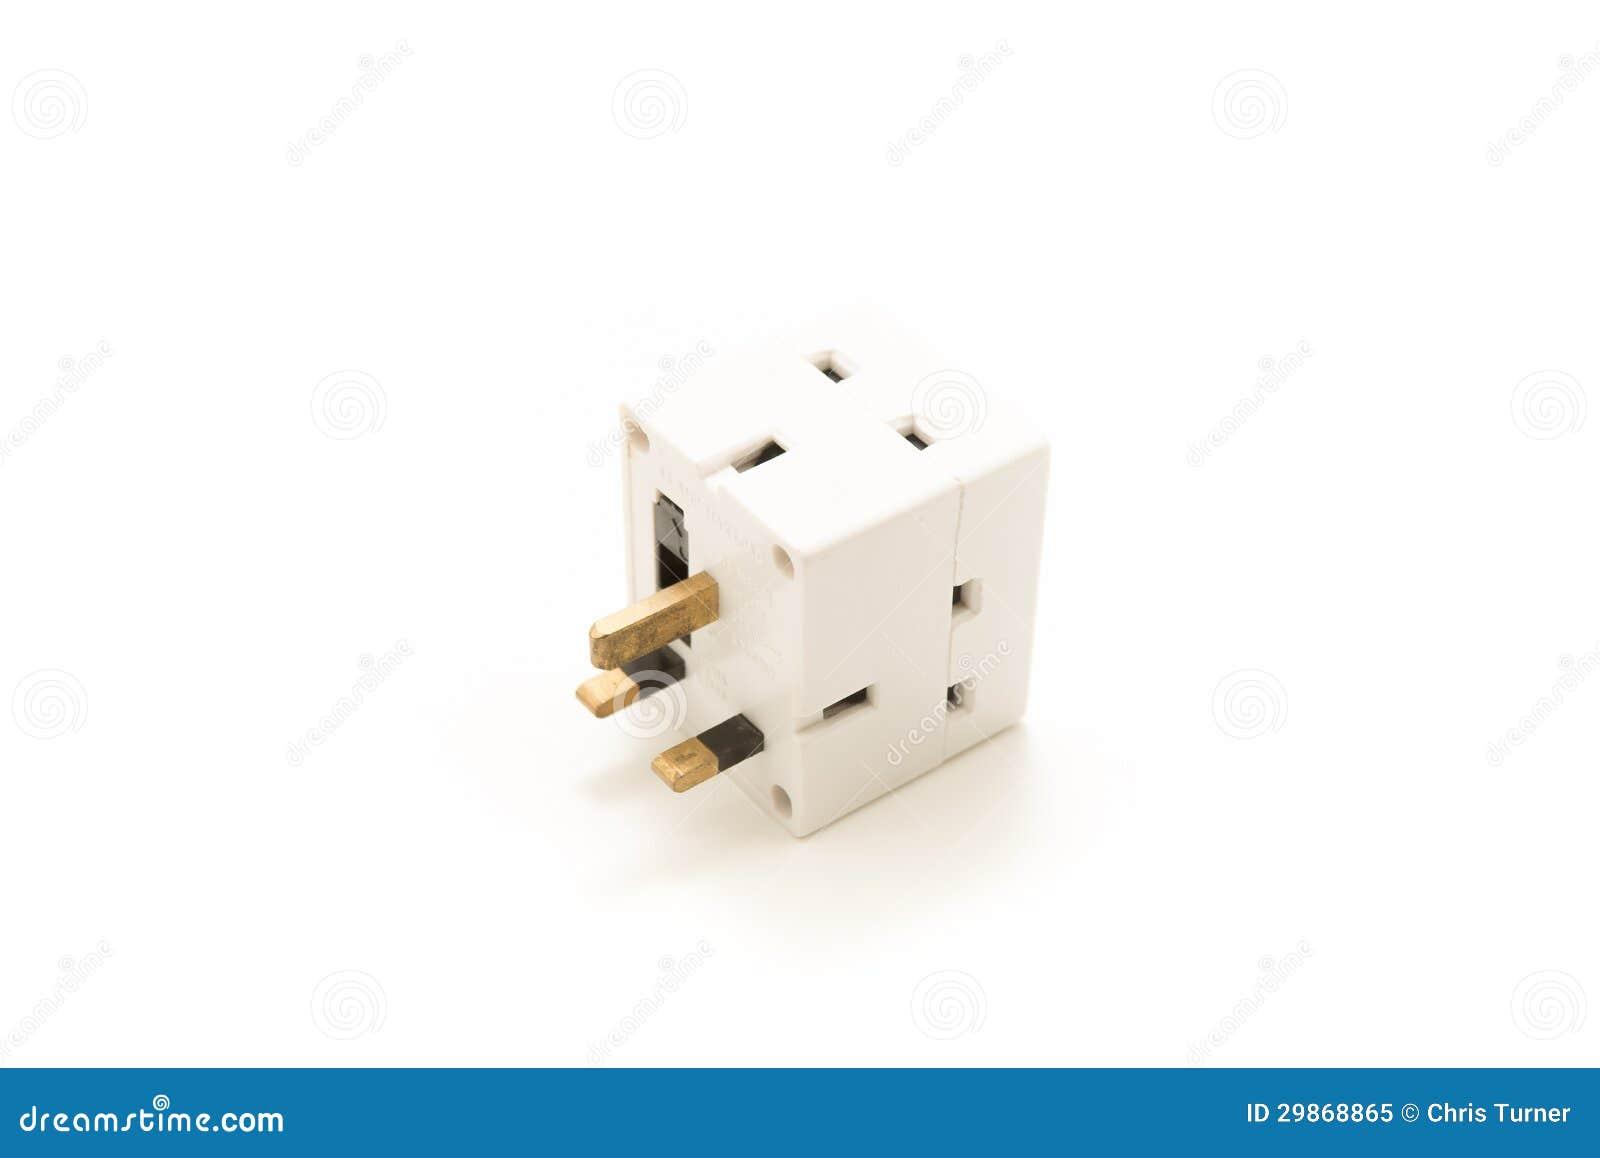 Dangerous Uk Plug Cube Plugging Multiple Three Pin Plugs One Socket